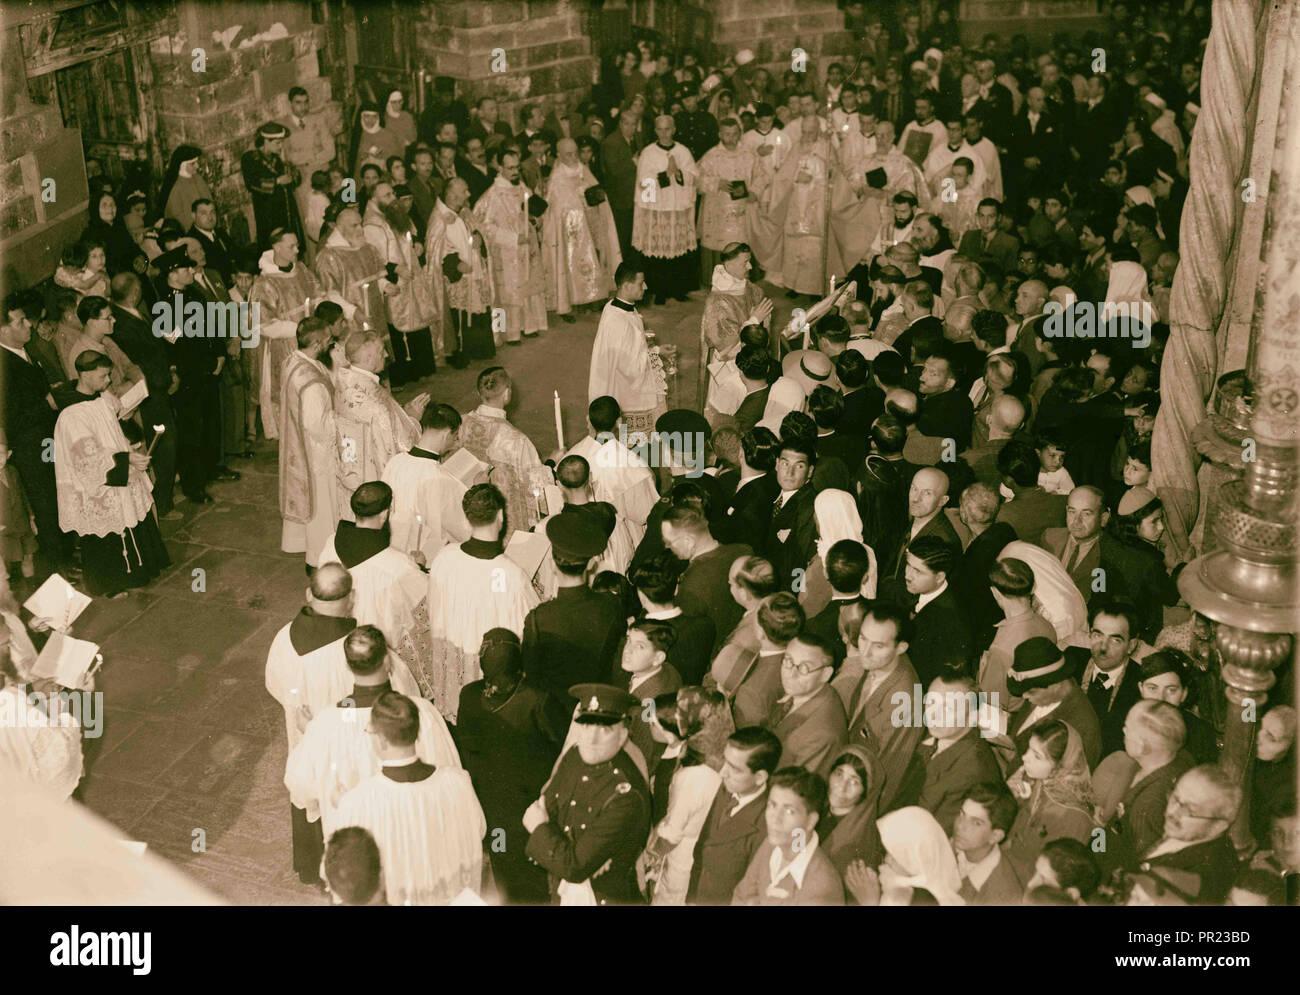 Calendrier 1941.Calendrier Des Ceremonies Religieuses A Jerusalem A Paques